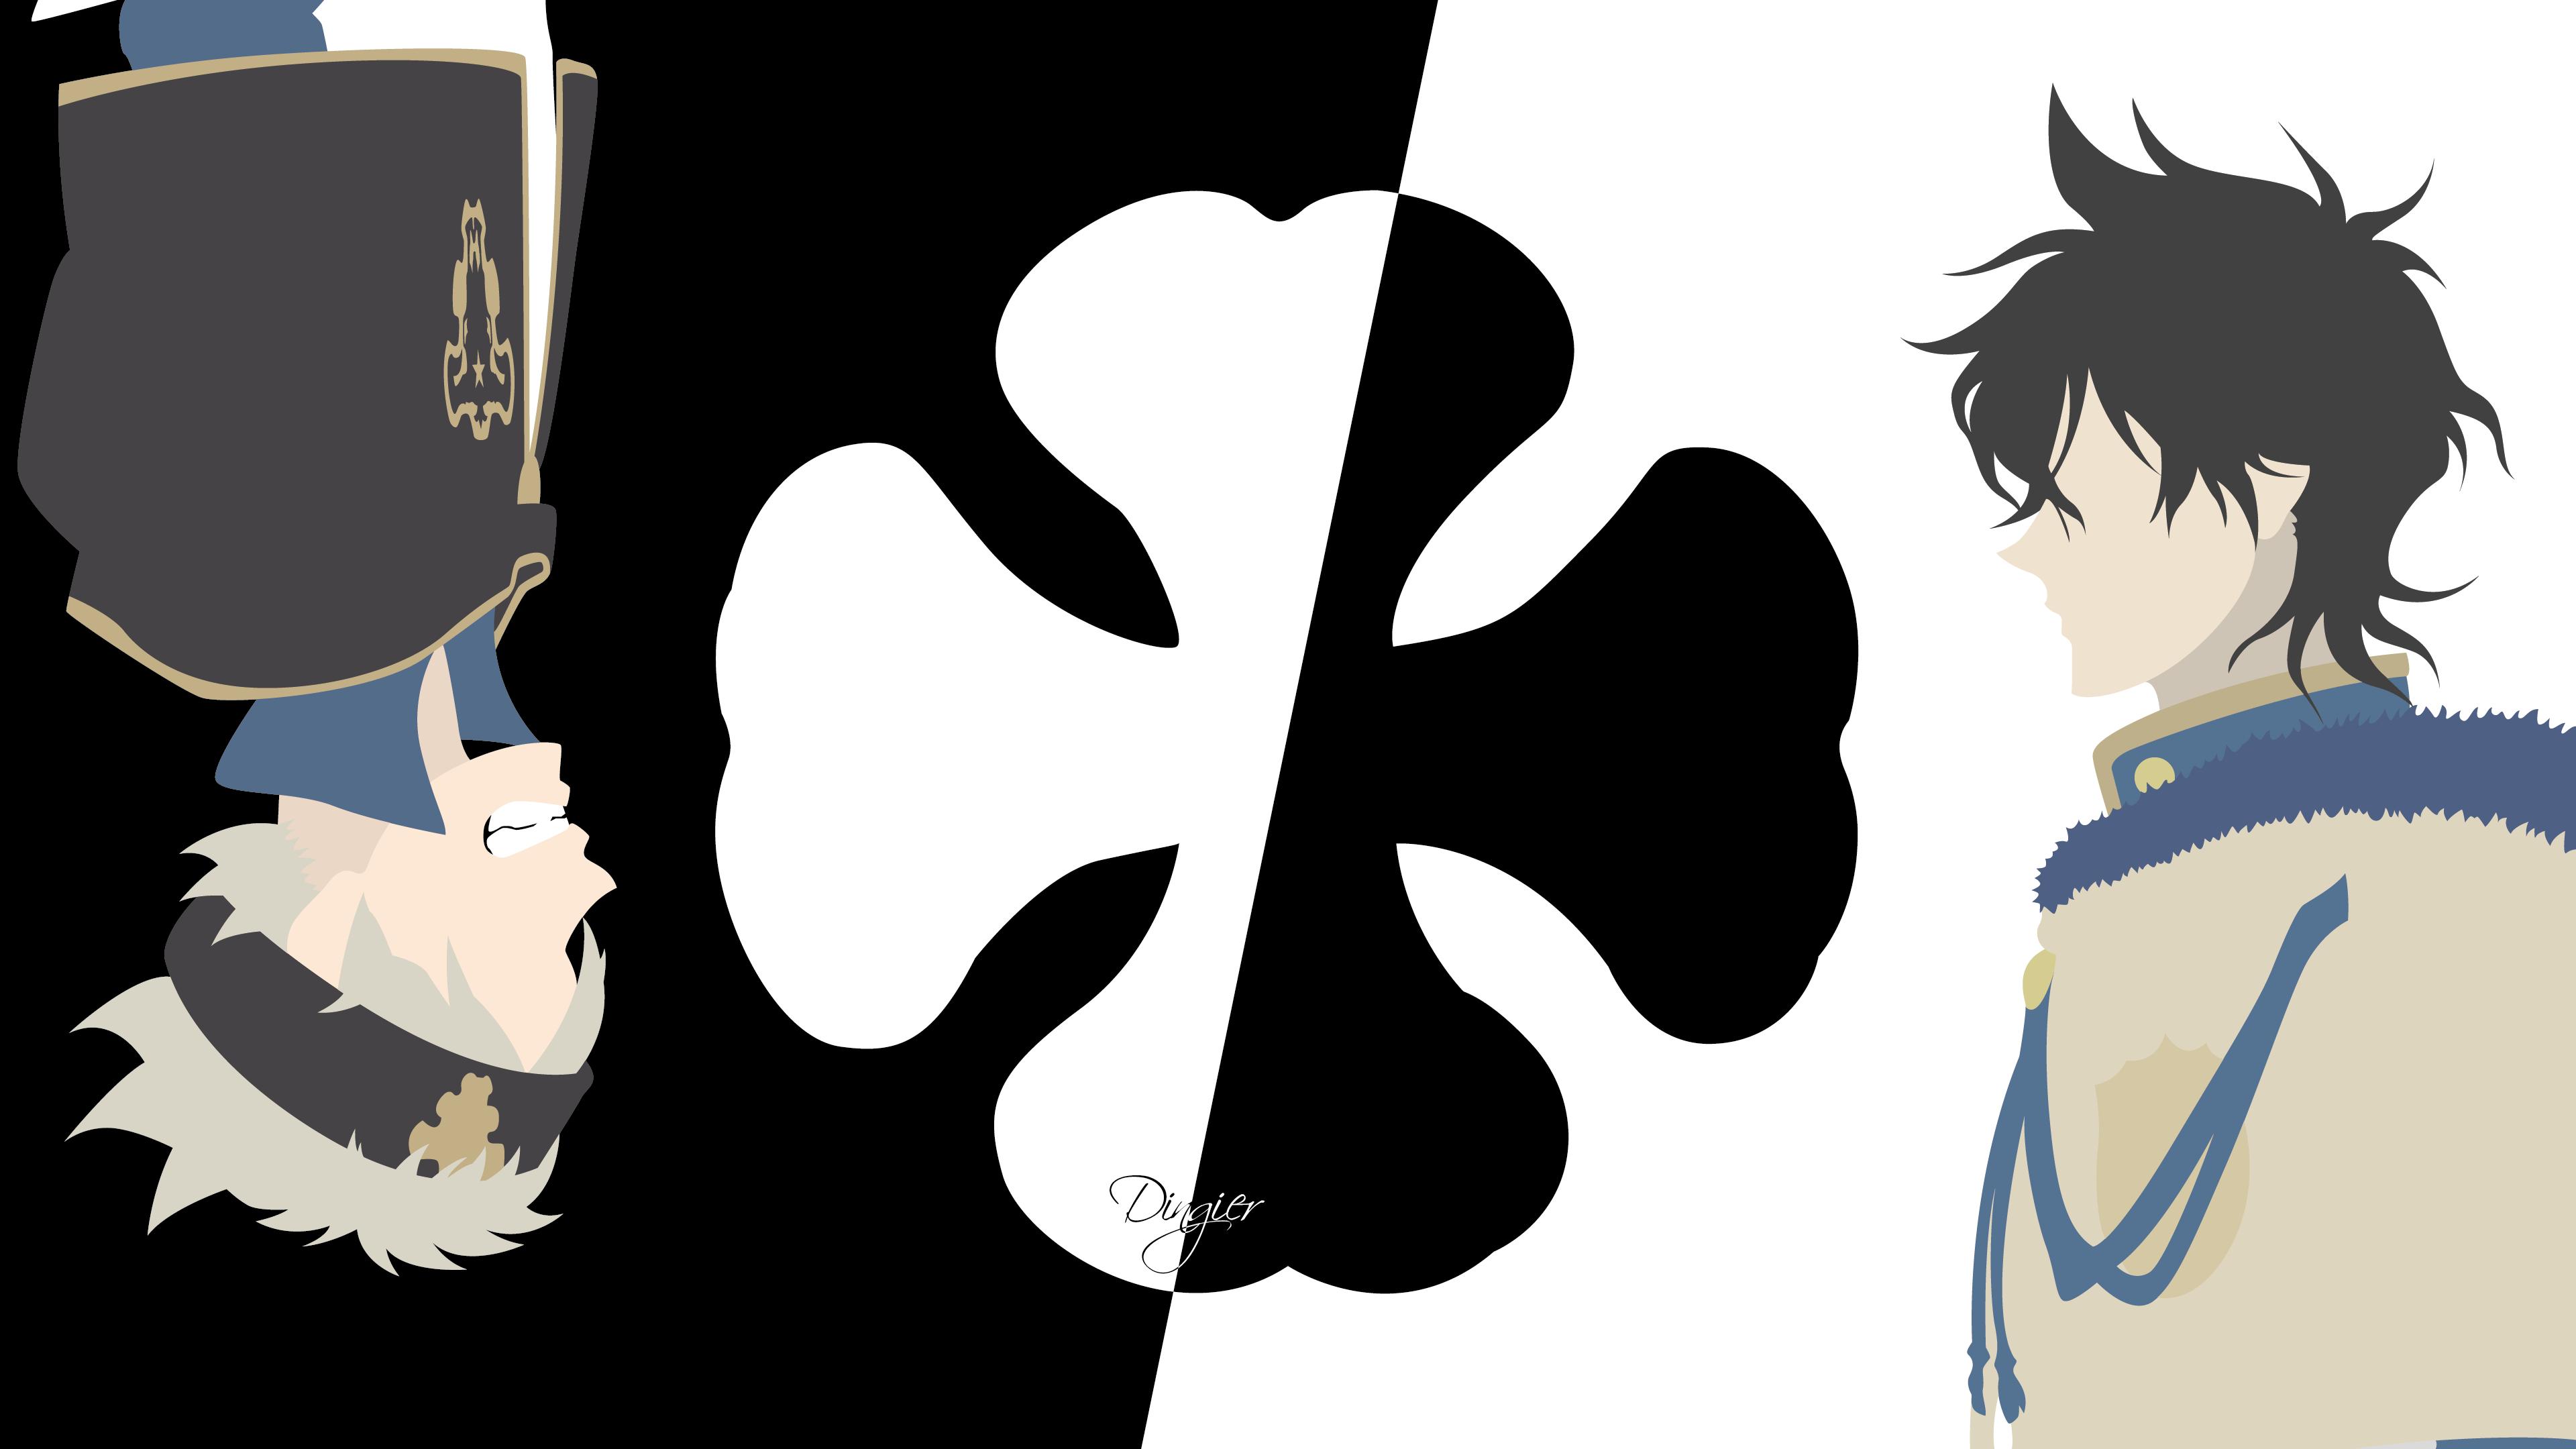 Wallpaper yuno asta black clover hd 4k free anime, black clover for desktop and mobile. Black Clover 4k Ultra HD Wallpaper | Background Image ...